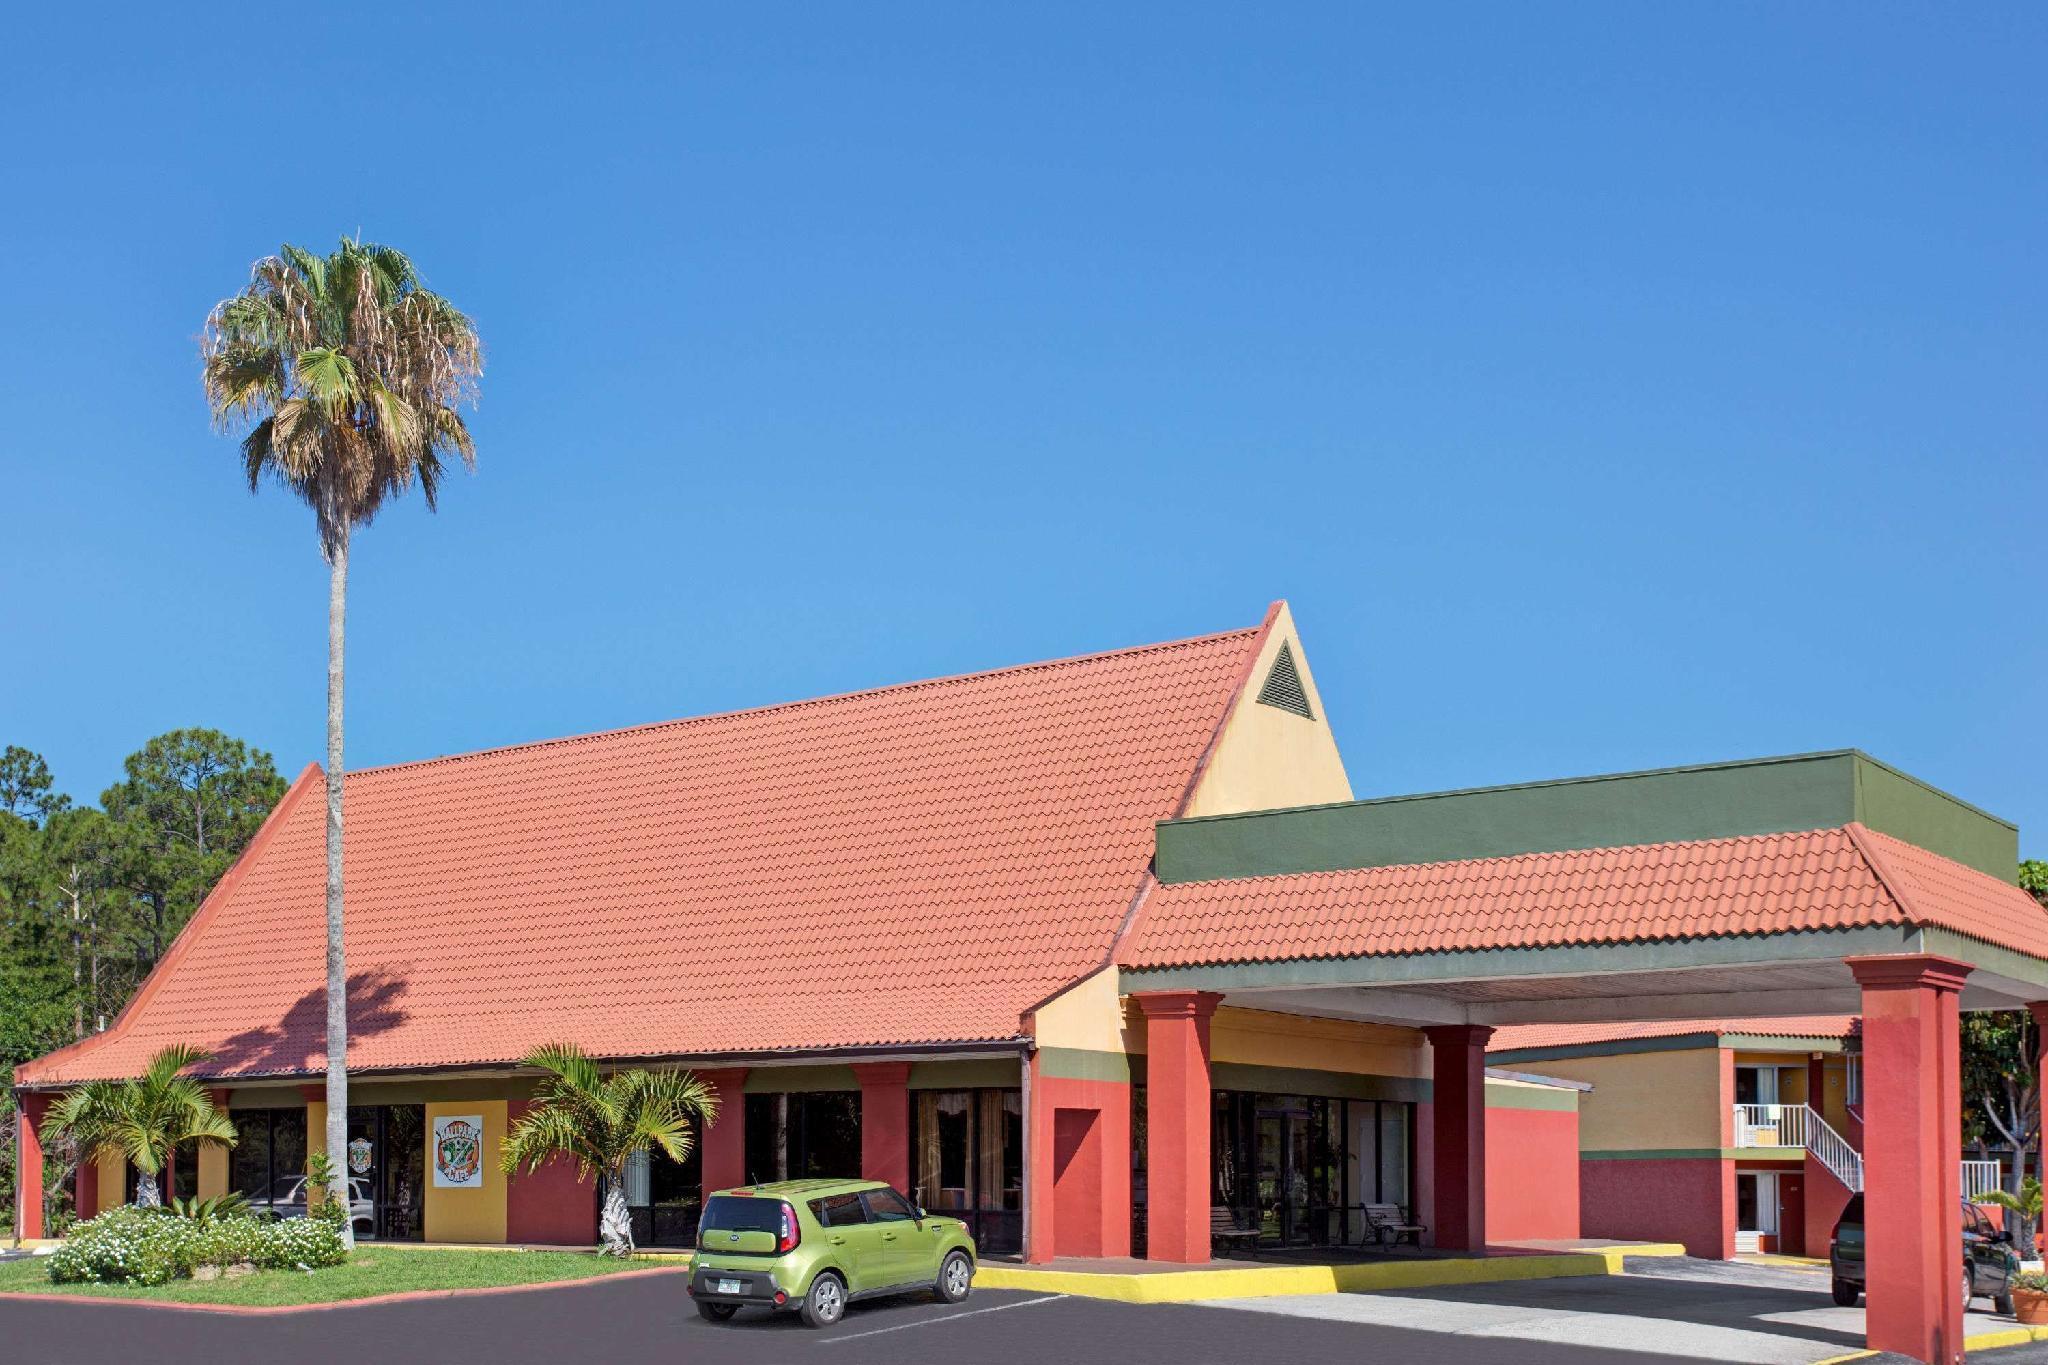 Days Inn By Wyndham Cocoa Cruiseport West At I 95 524